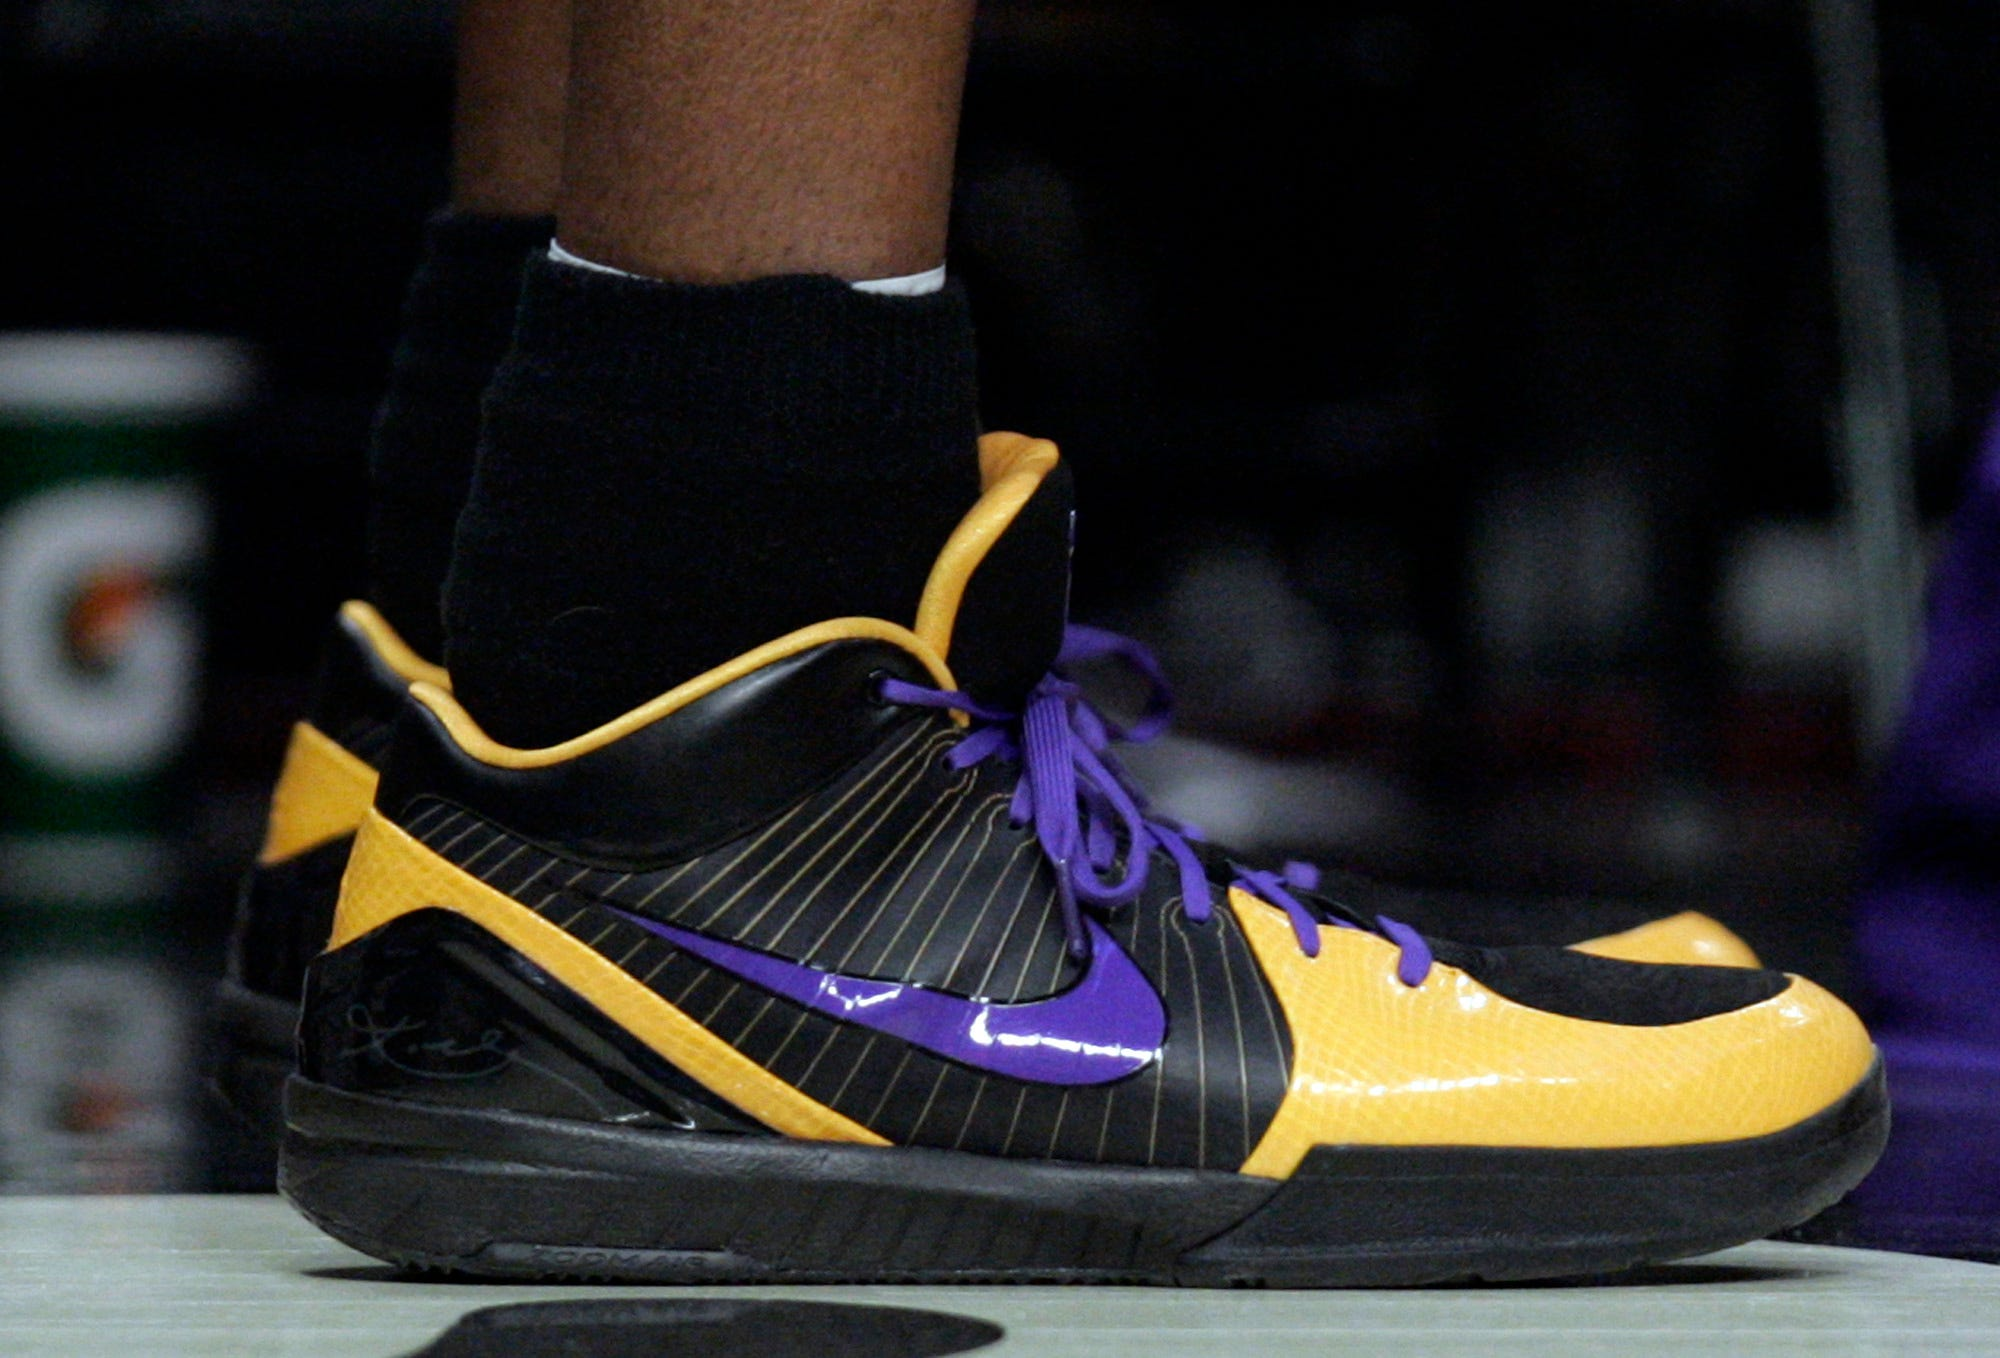 Nike sells out of Kobe Bryant